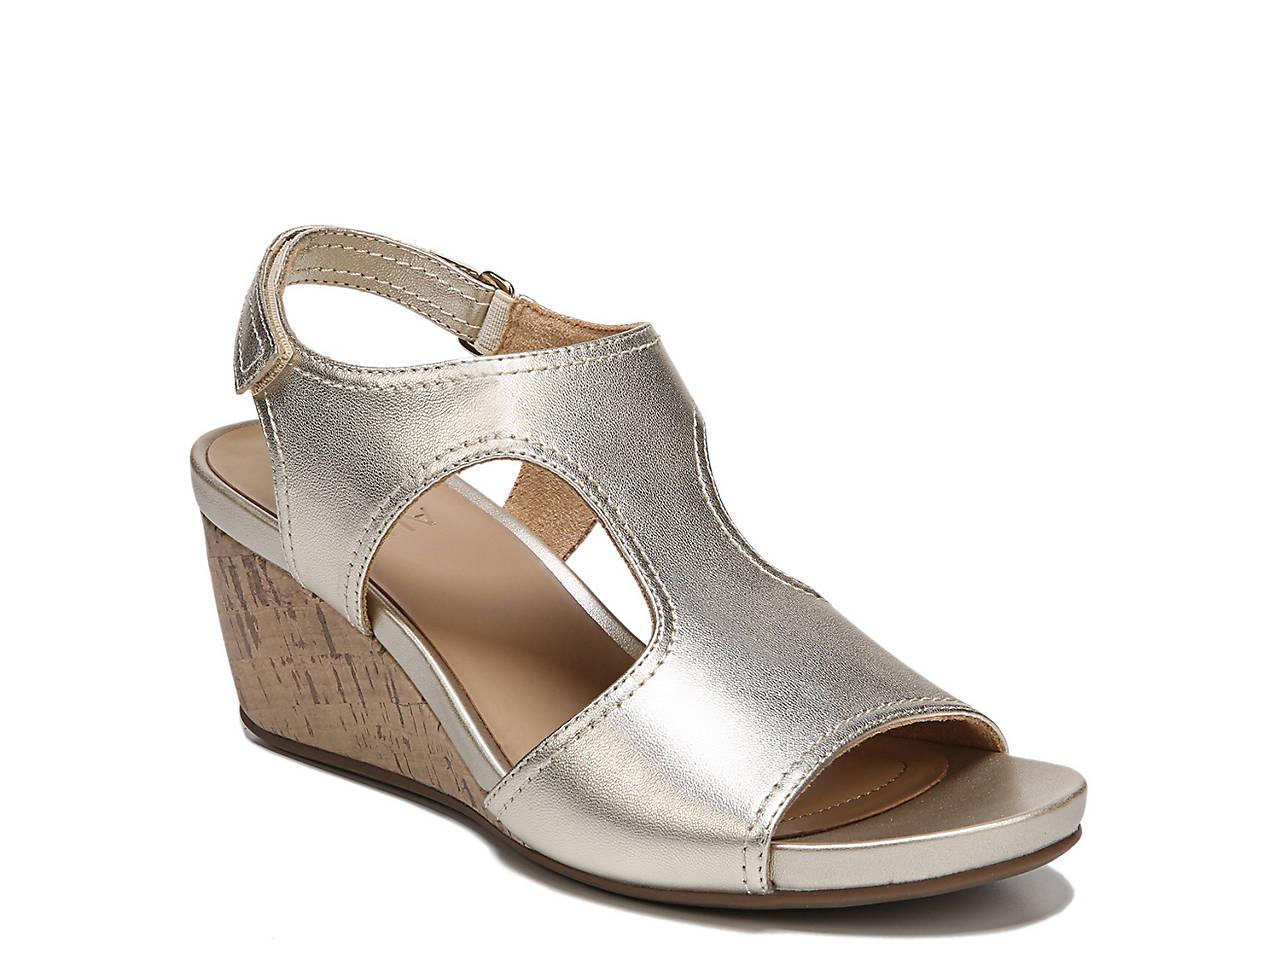 fabc1e79007 Naturalizer Cinda Wedge Sandal Women s Shoes